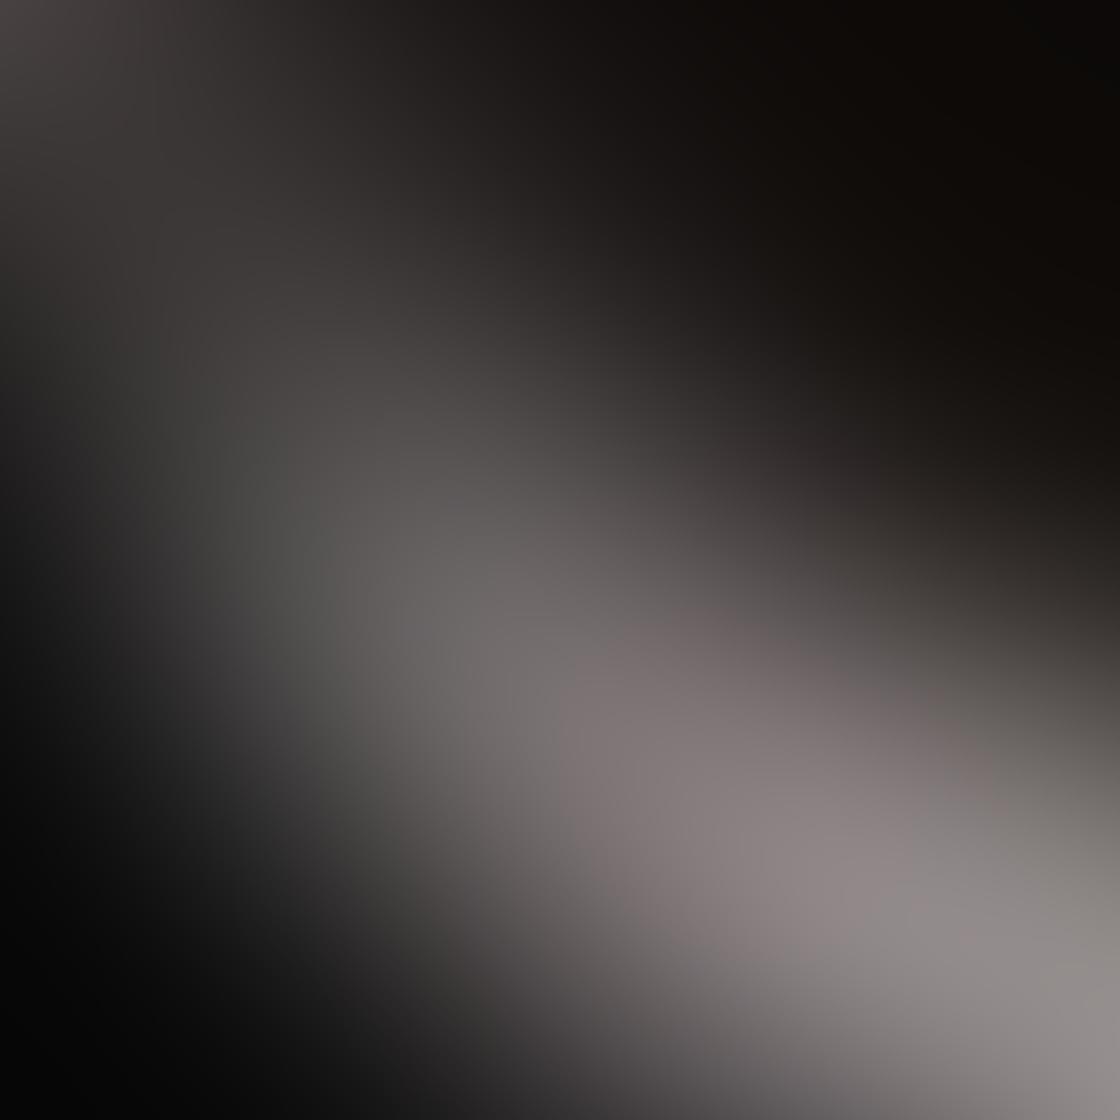 Shadow iPhone Photos 20